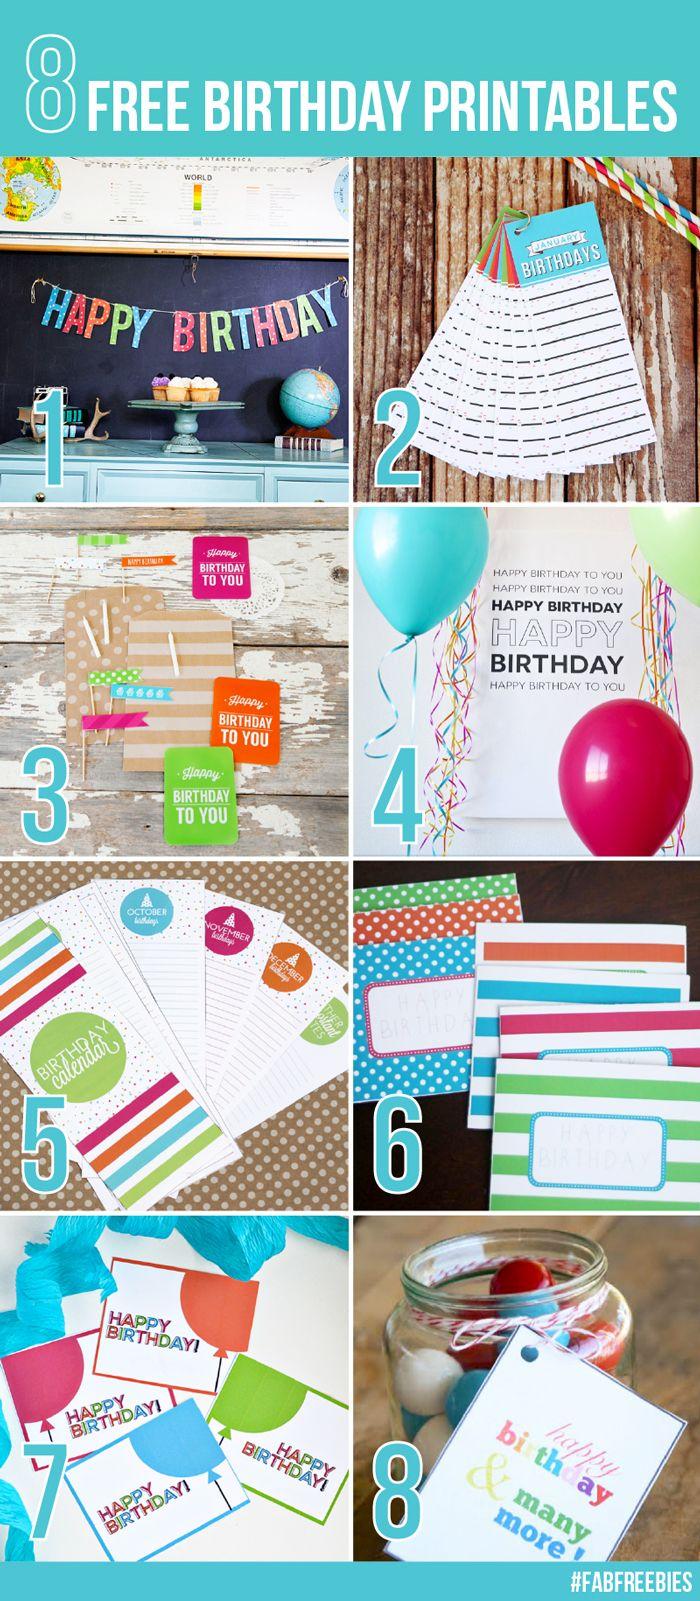 Whipperberry: Gold Polka Dot Happy Birthday Banner + 7 More Free Birthday Printables